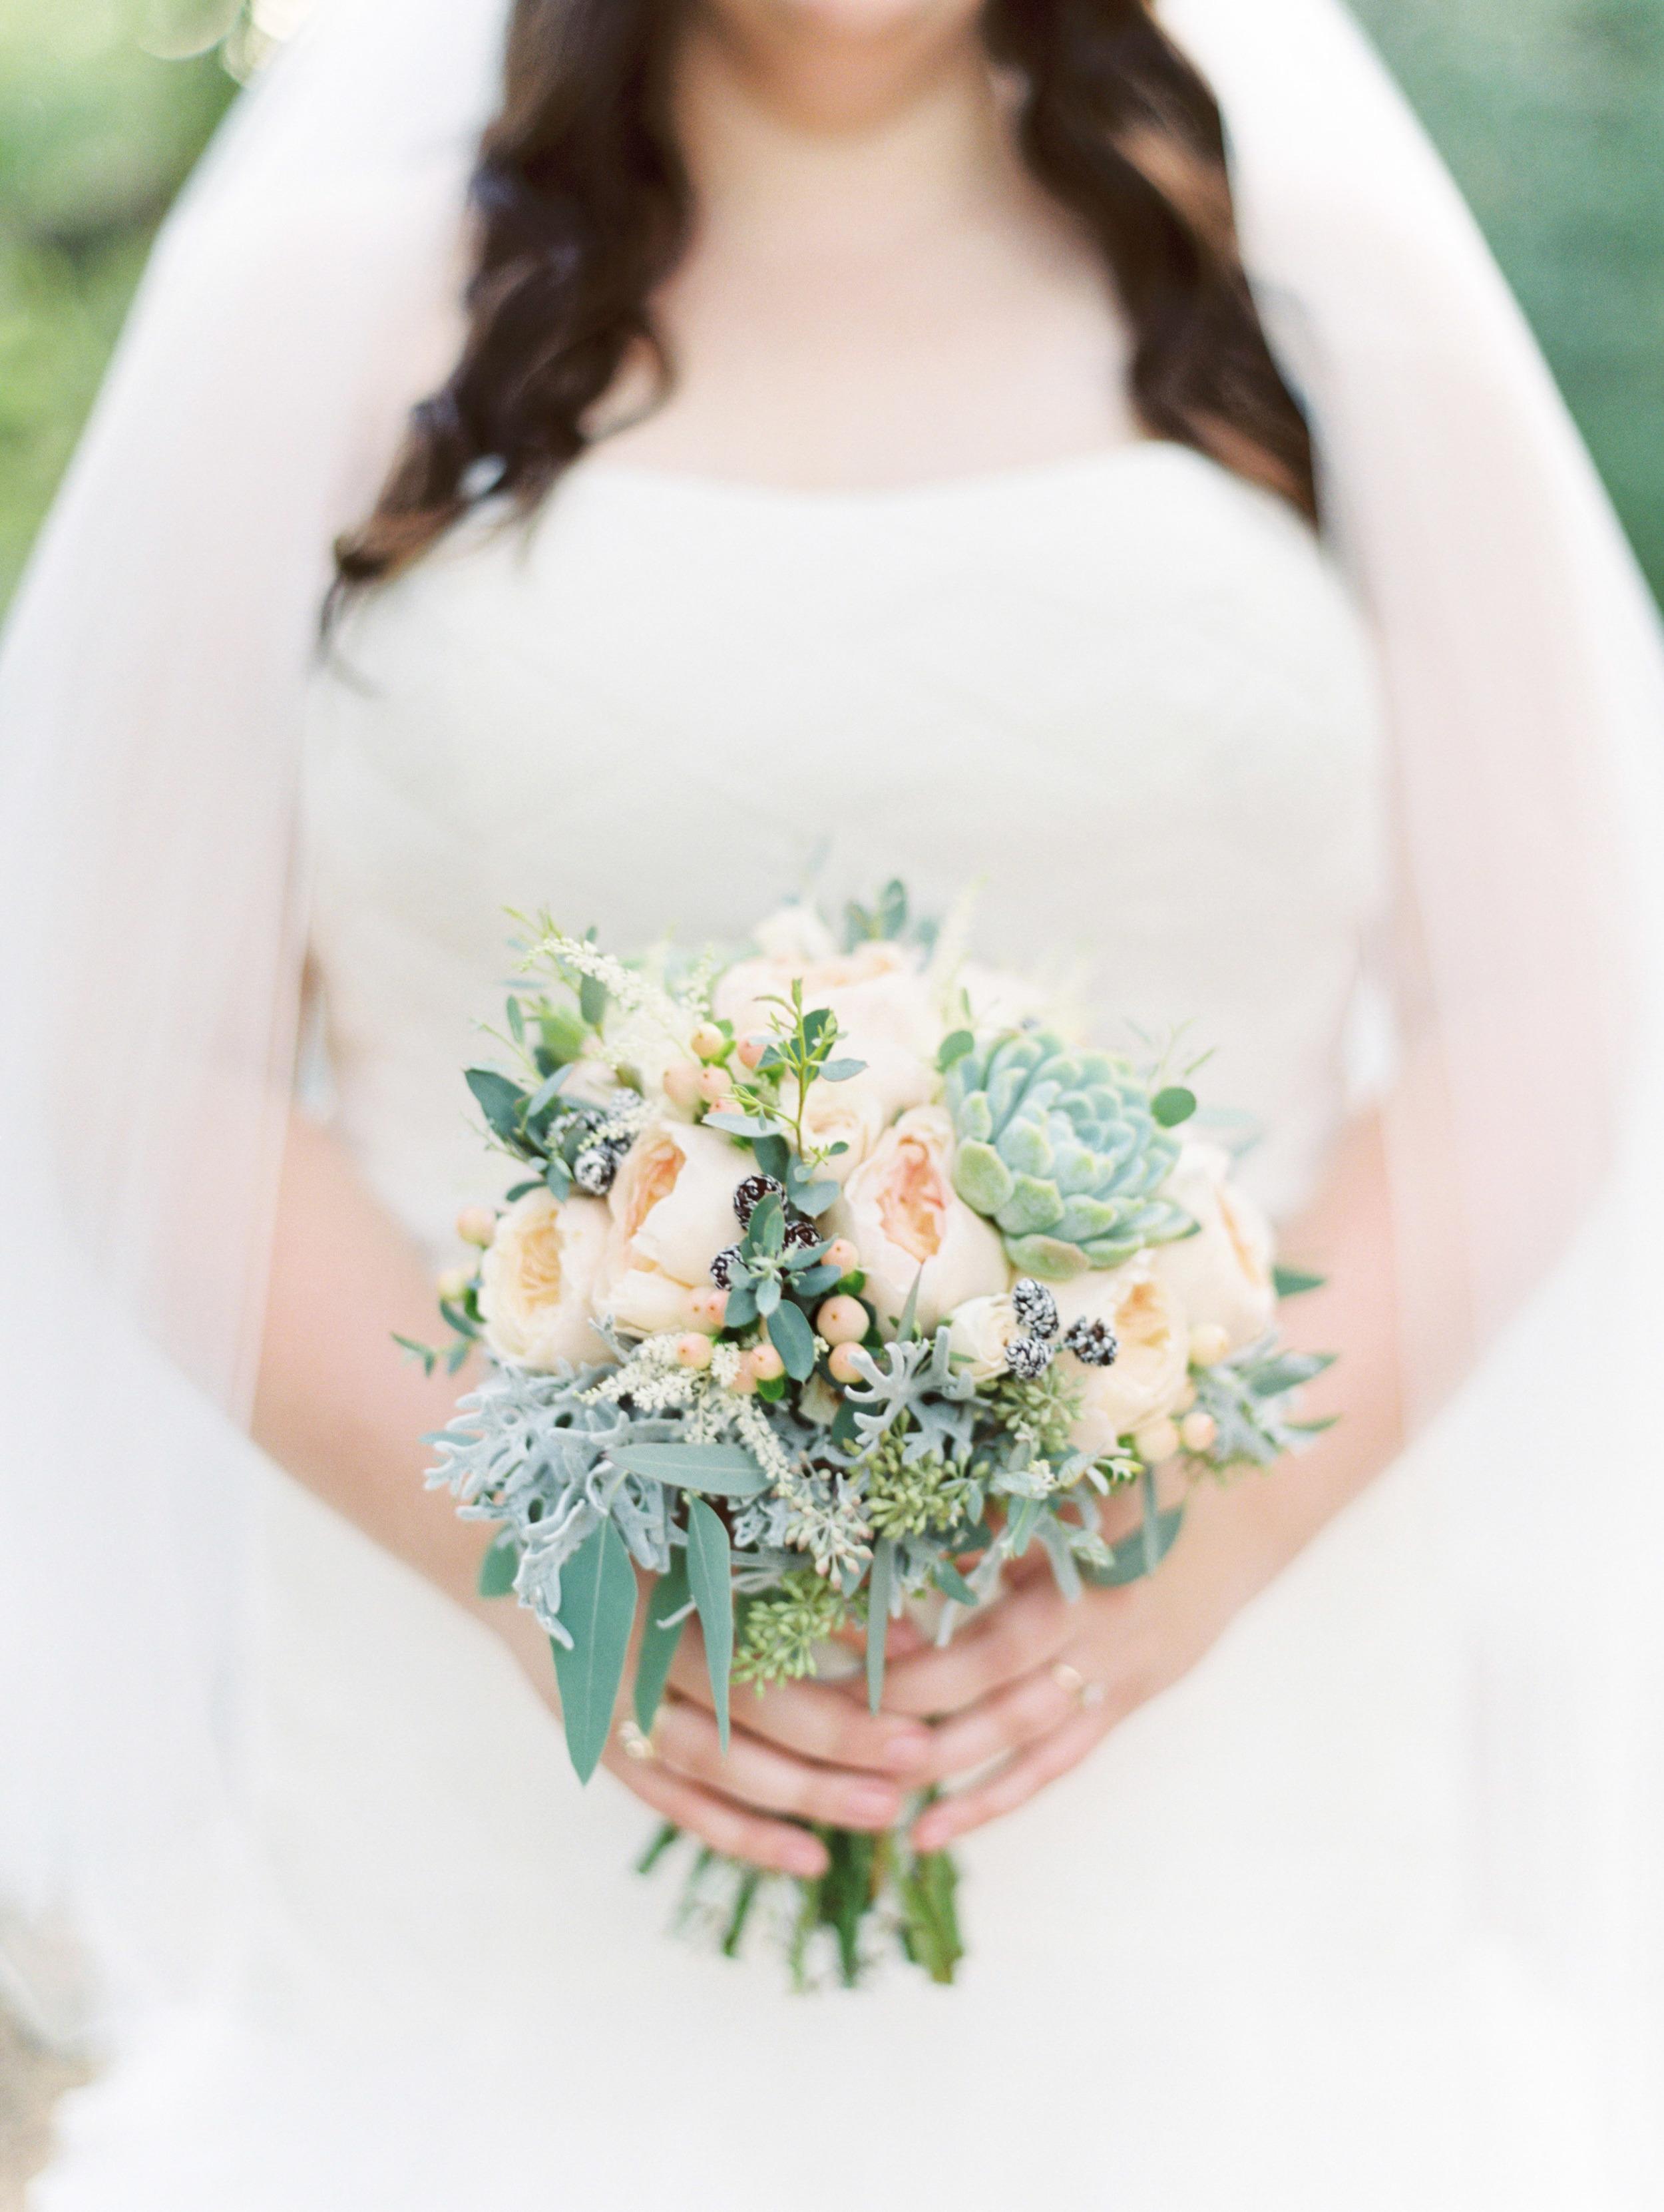 Sarah Best Photography - Elizabeth's Bridals - 7F Lodge-127.jpg